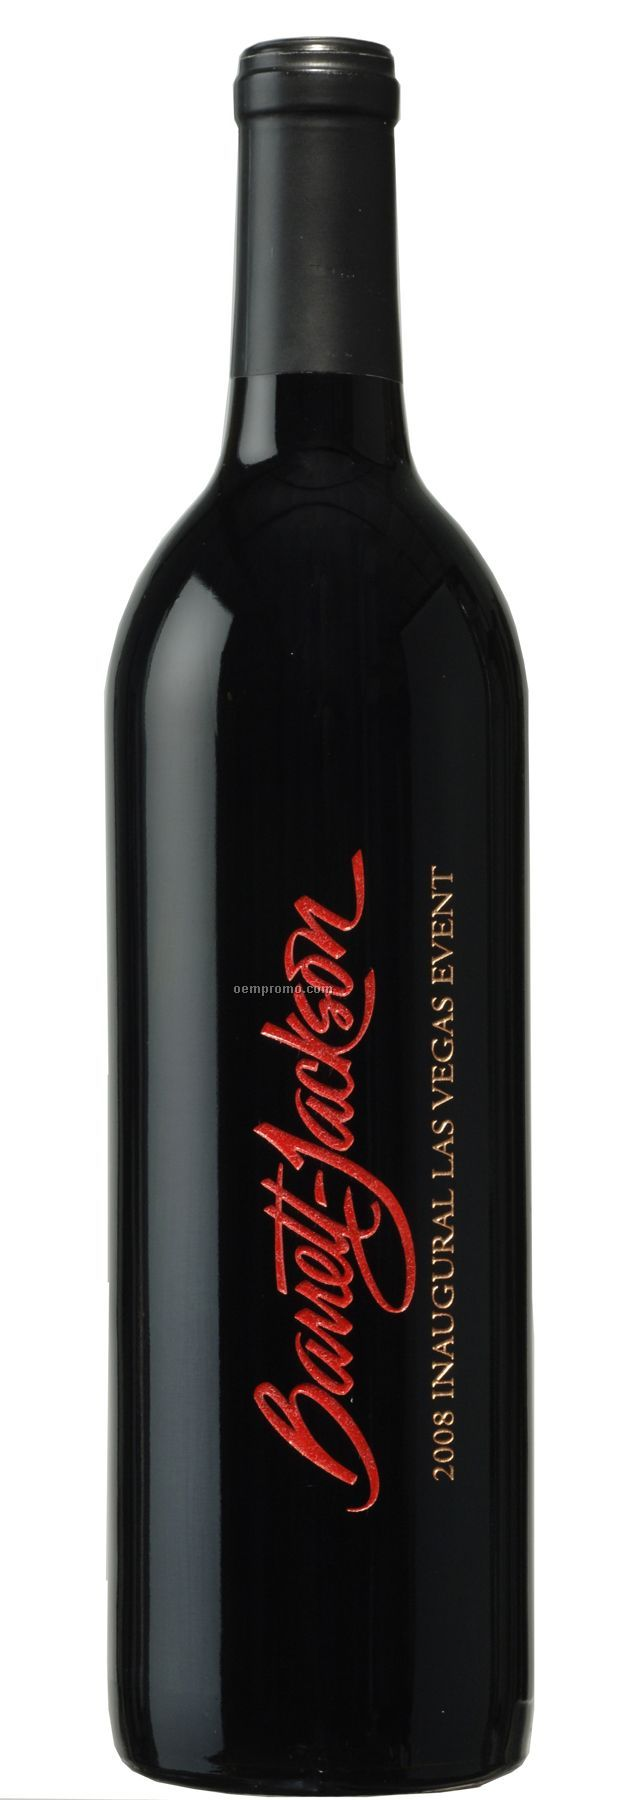 2008 Wv Meritage, Sonoma County Platinum Series (Etched Wine)